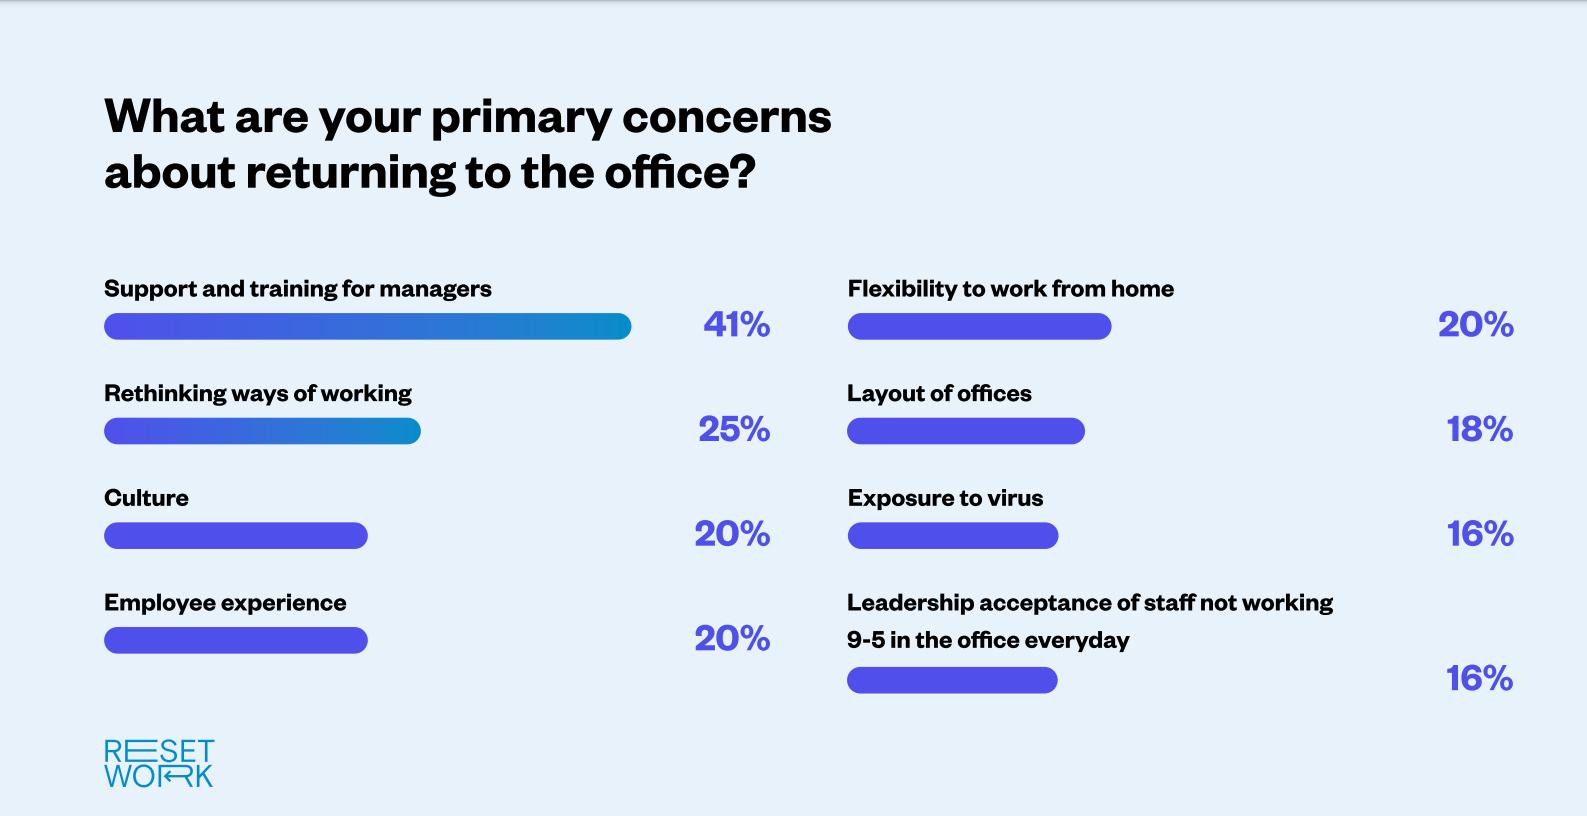 Reset Work survey